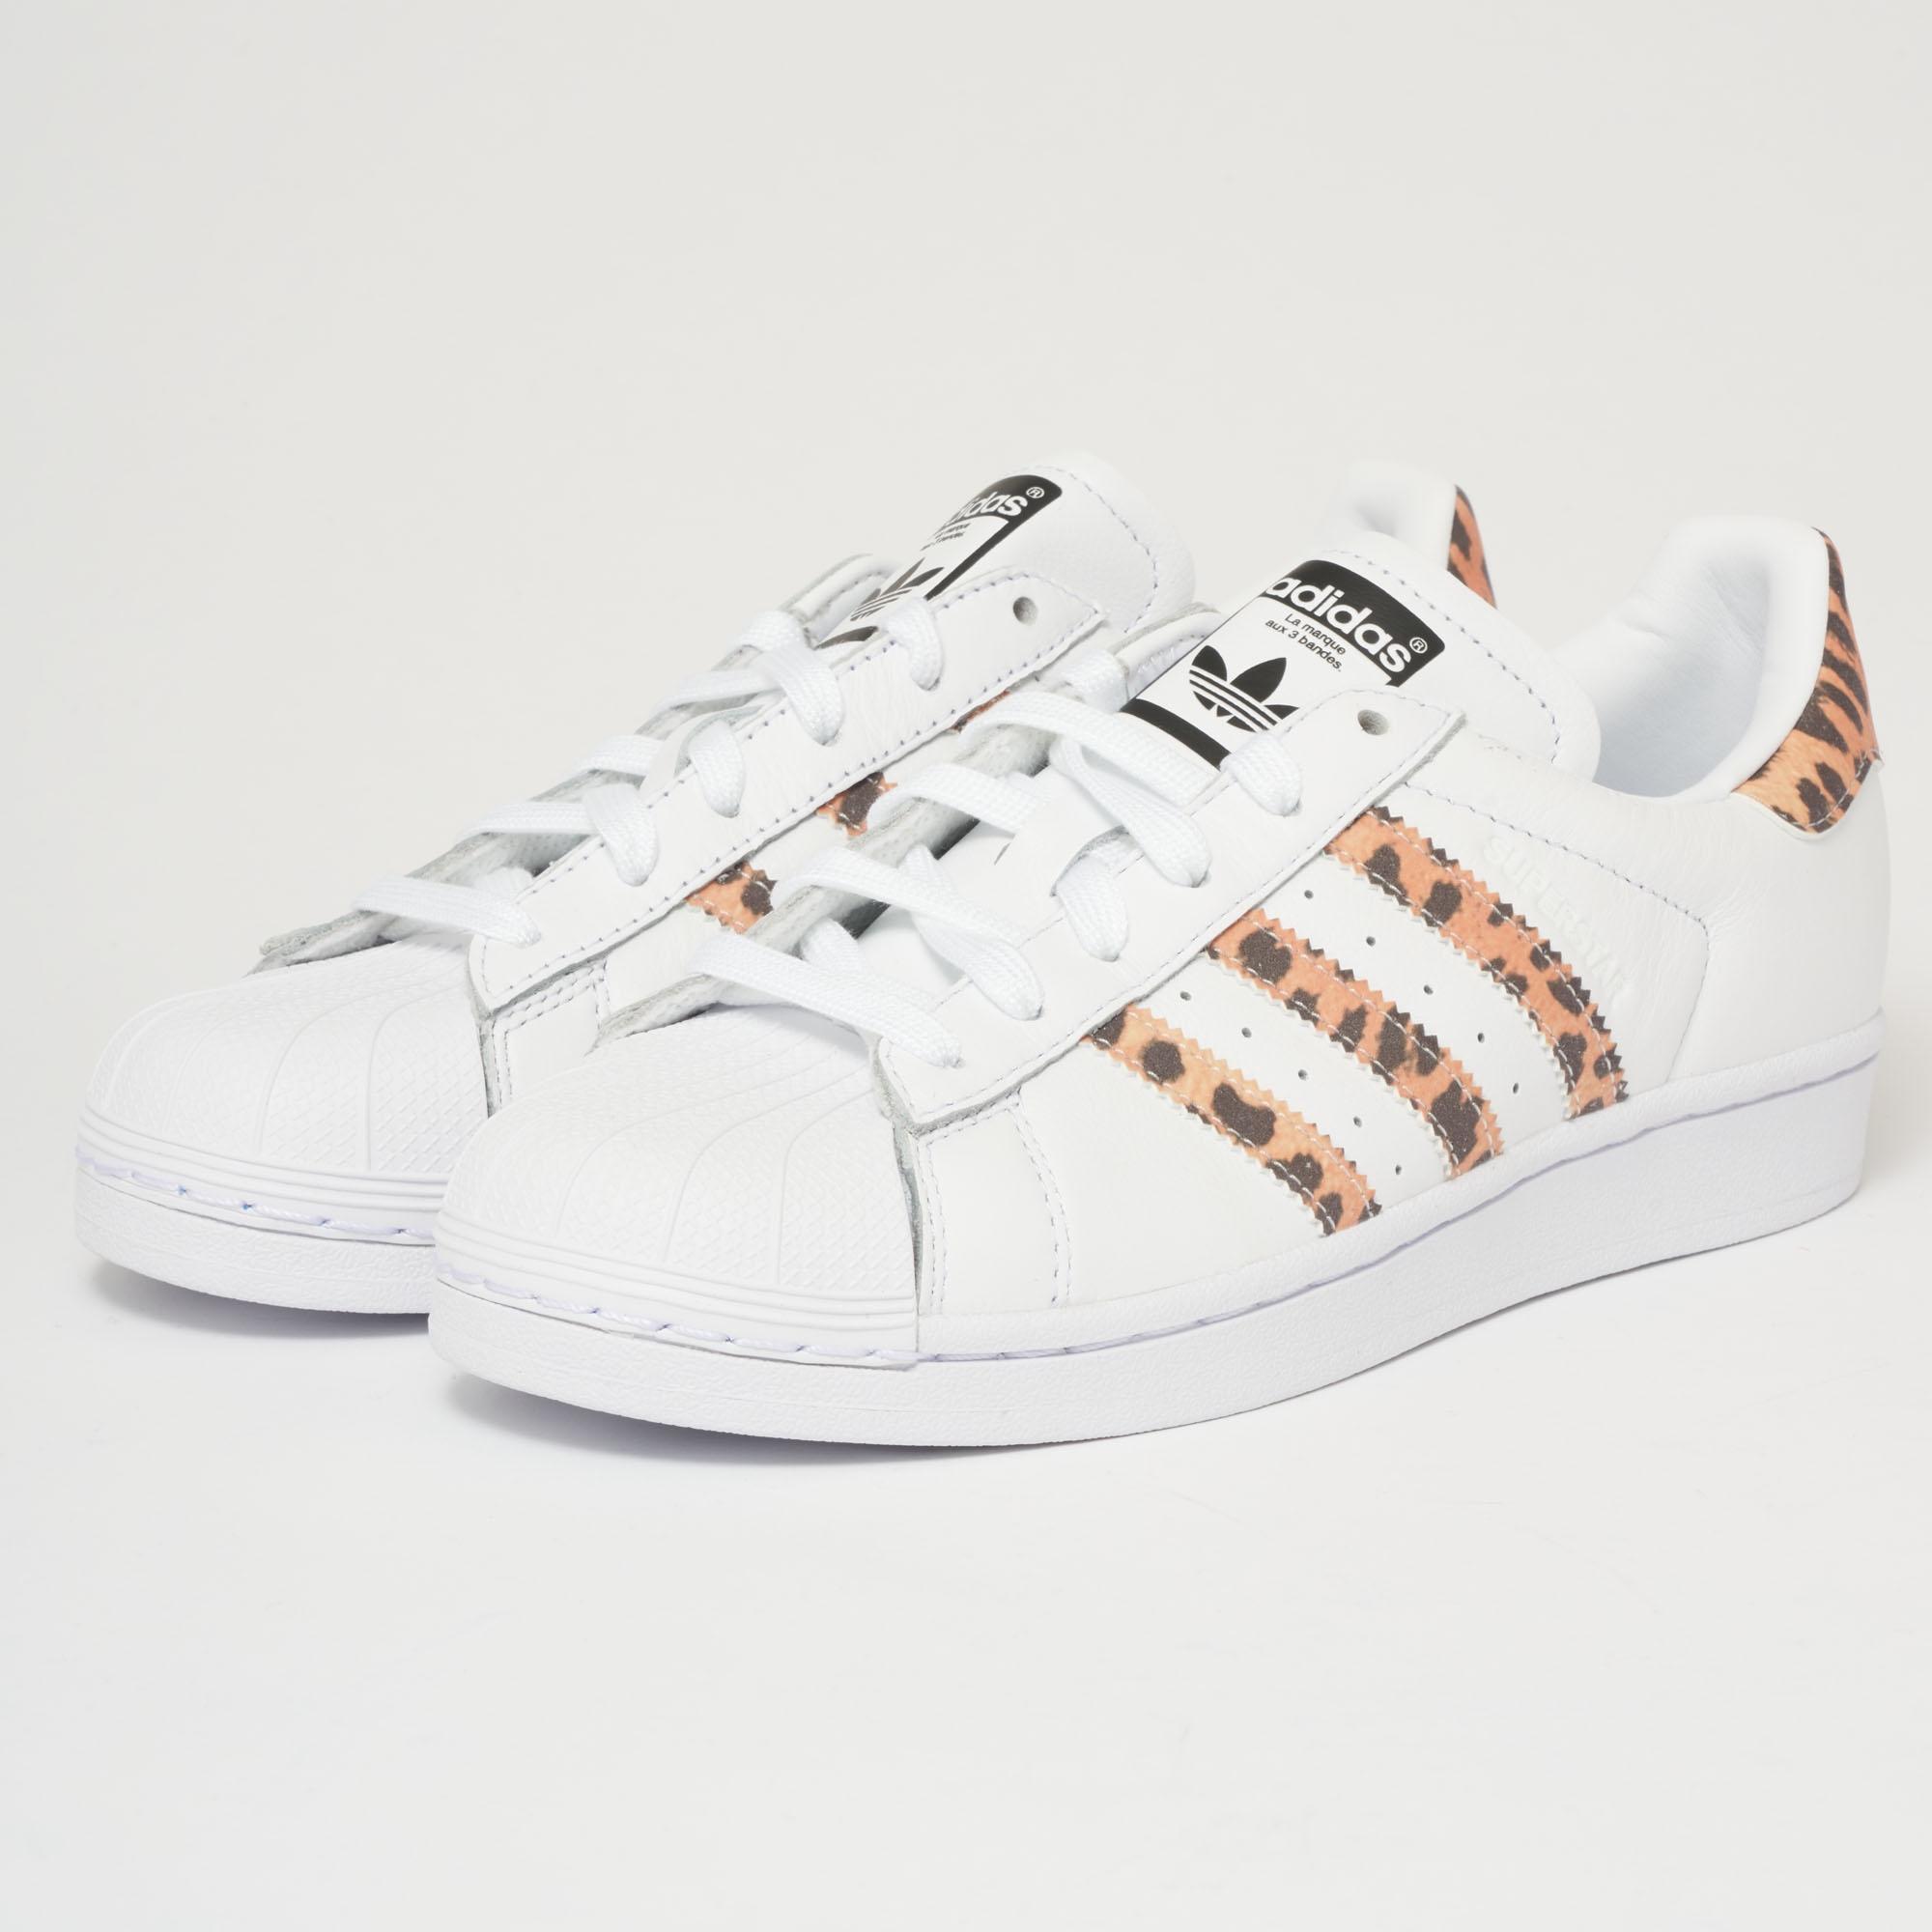 Adidas Originals Superstar White & Tiger Print